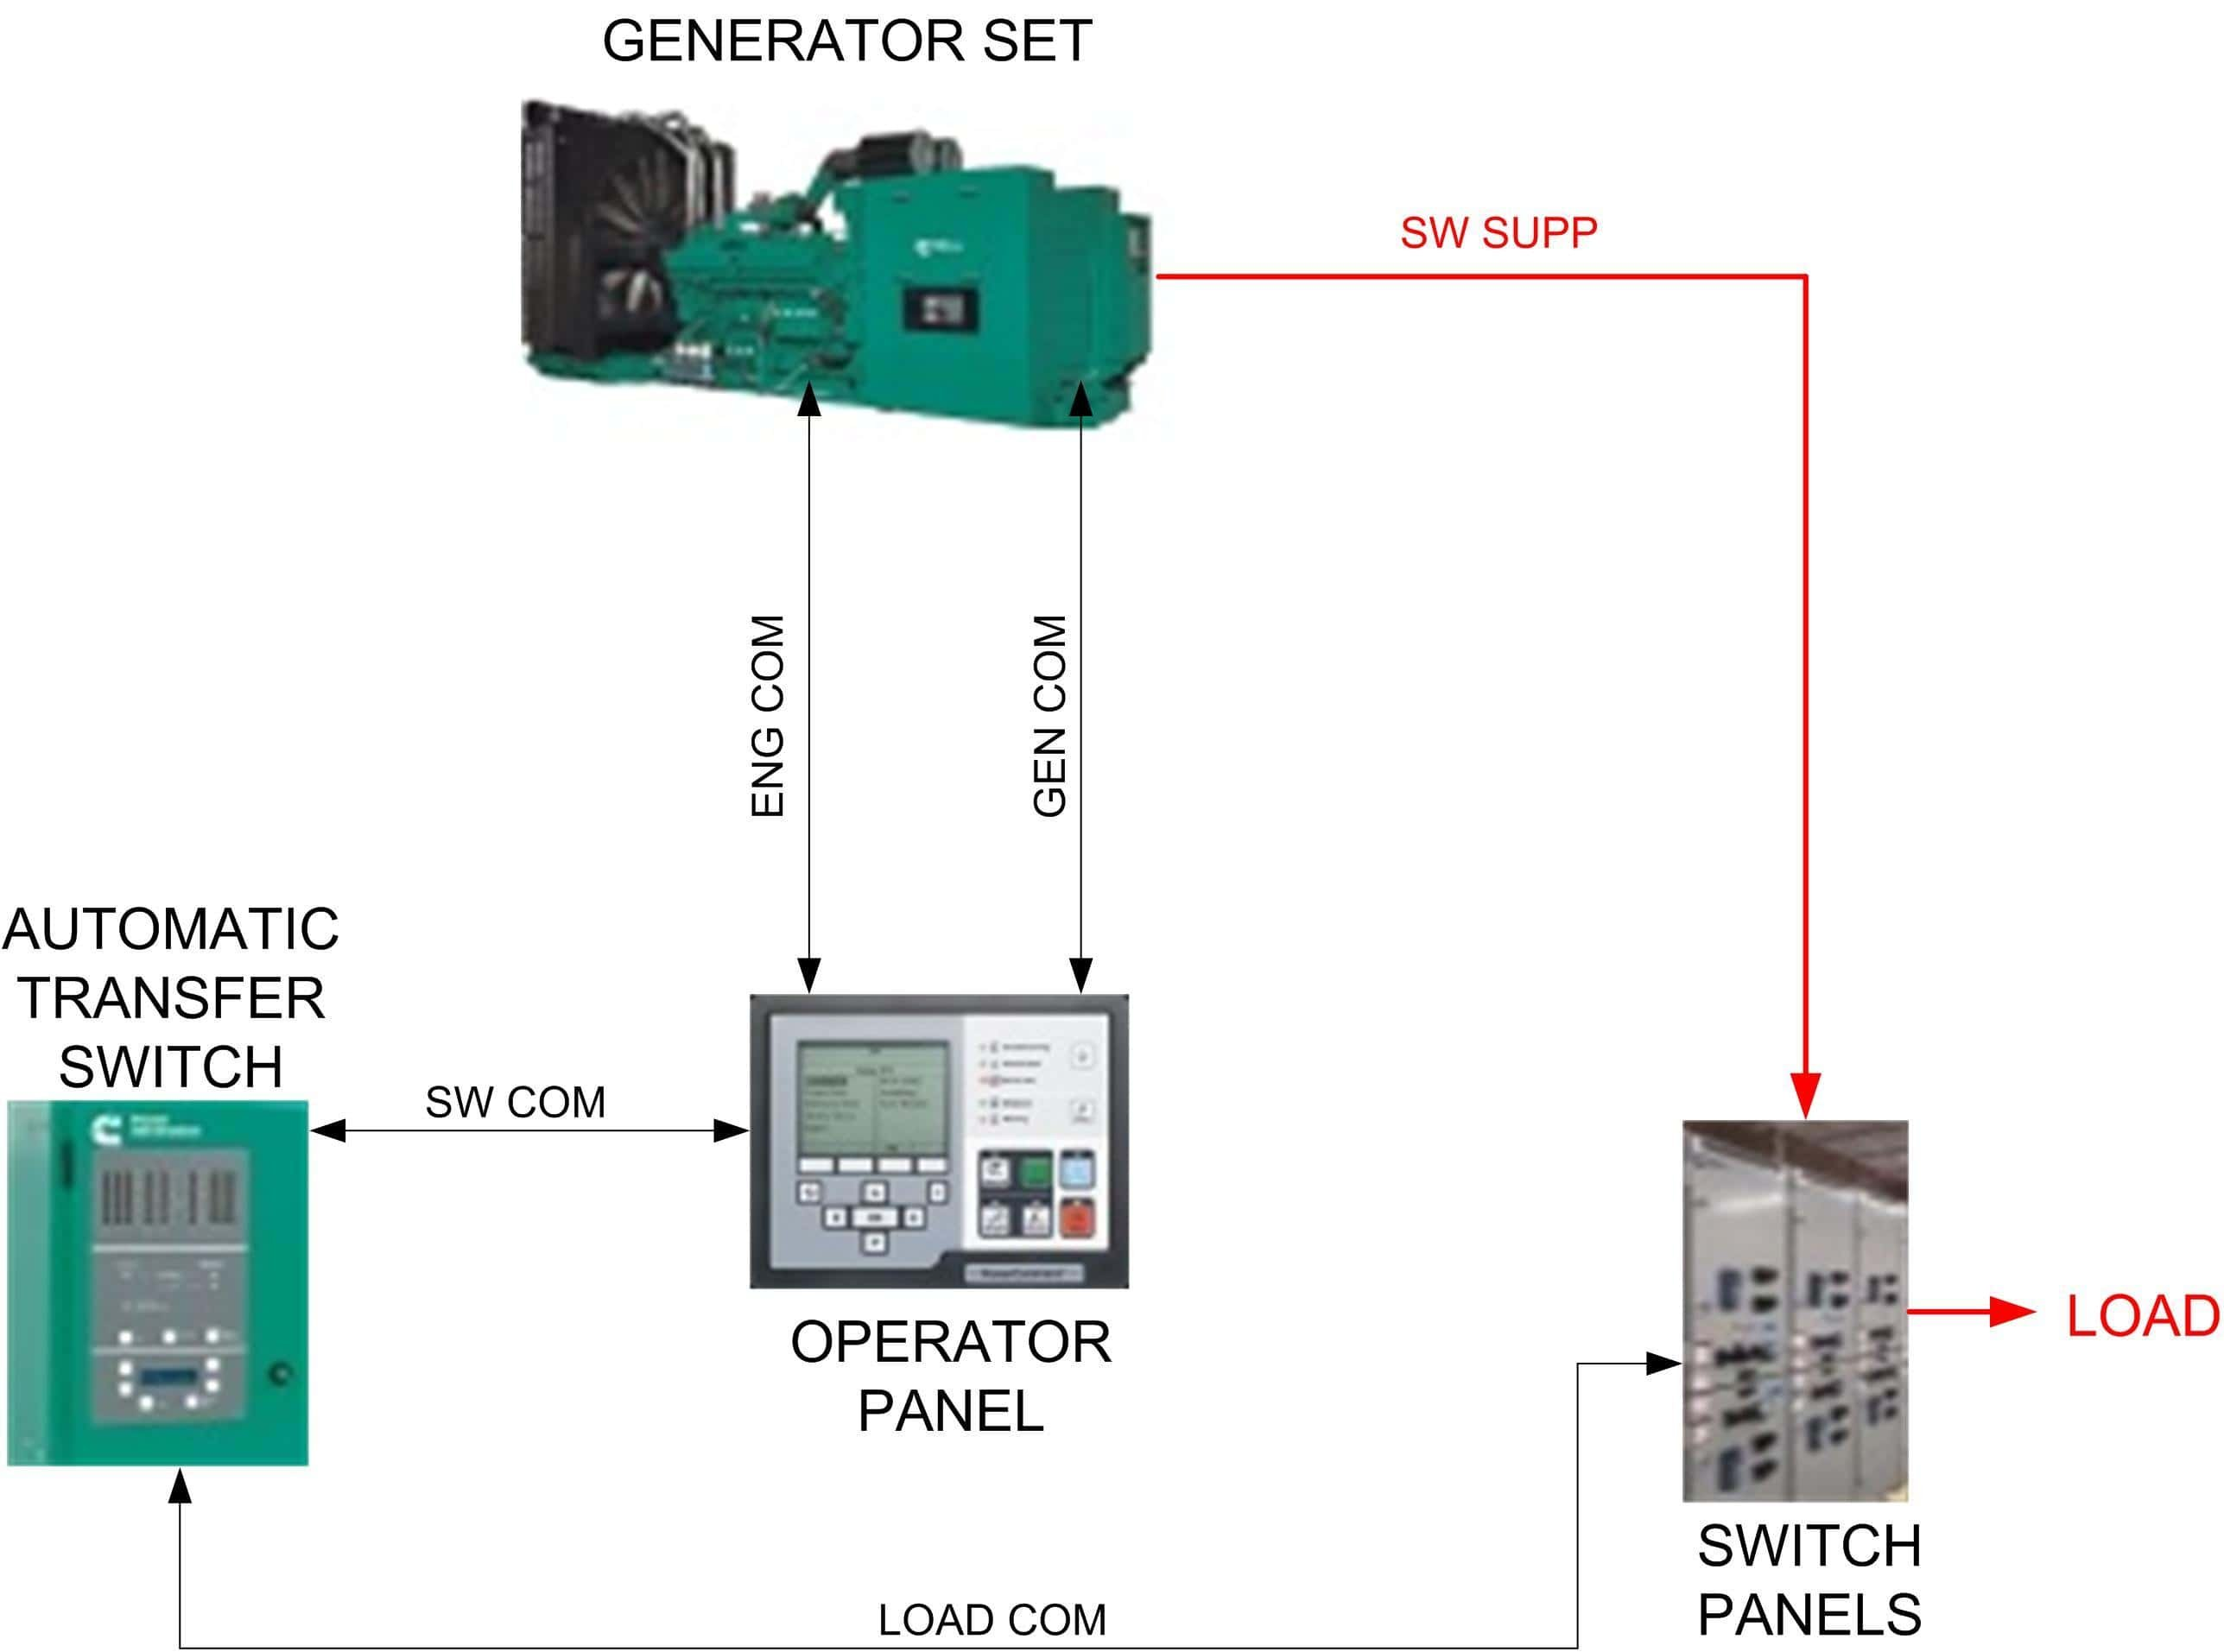 diesel generator control panel wiring diagram 1963 impala katolight 34